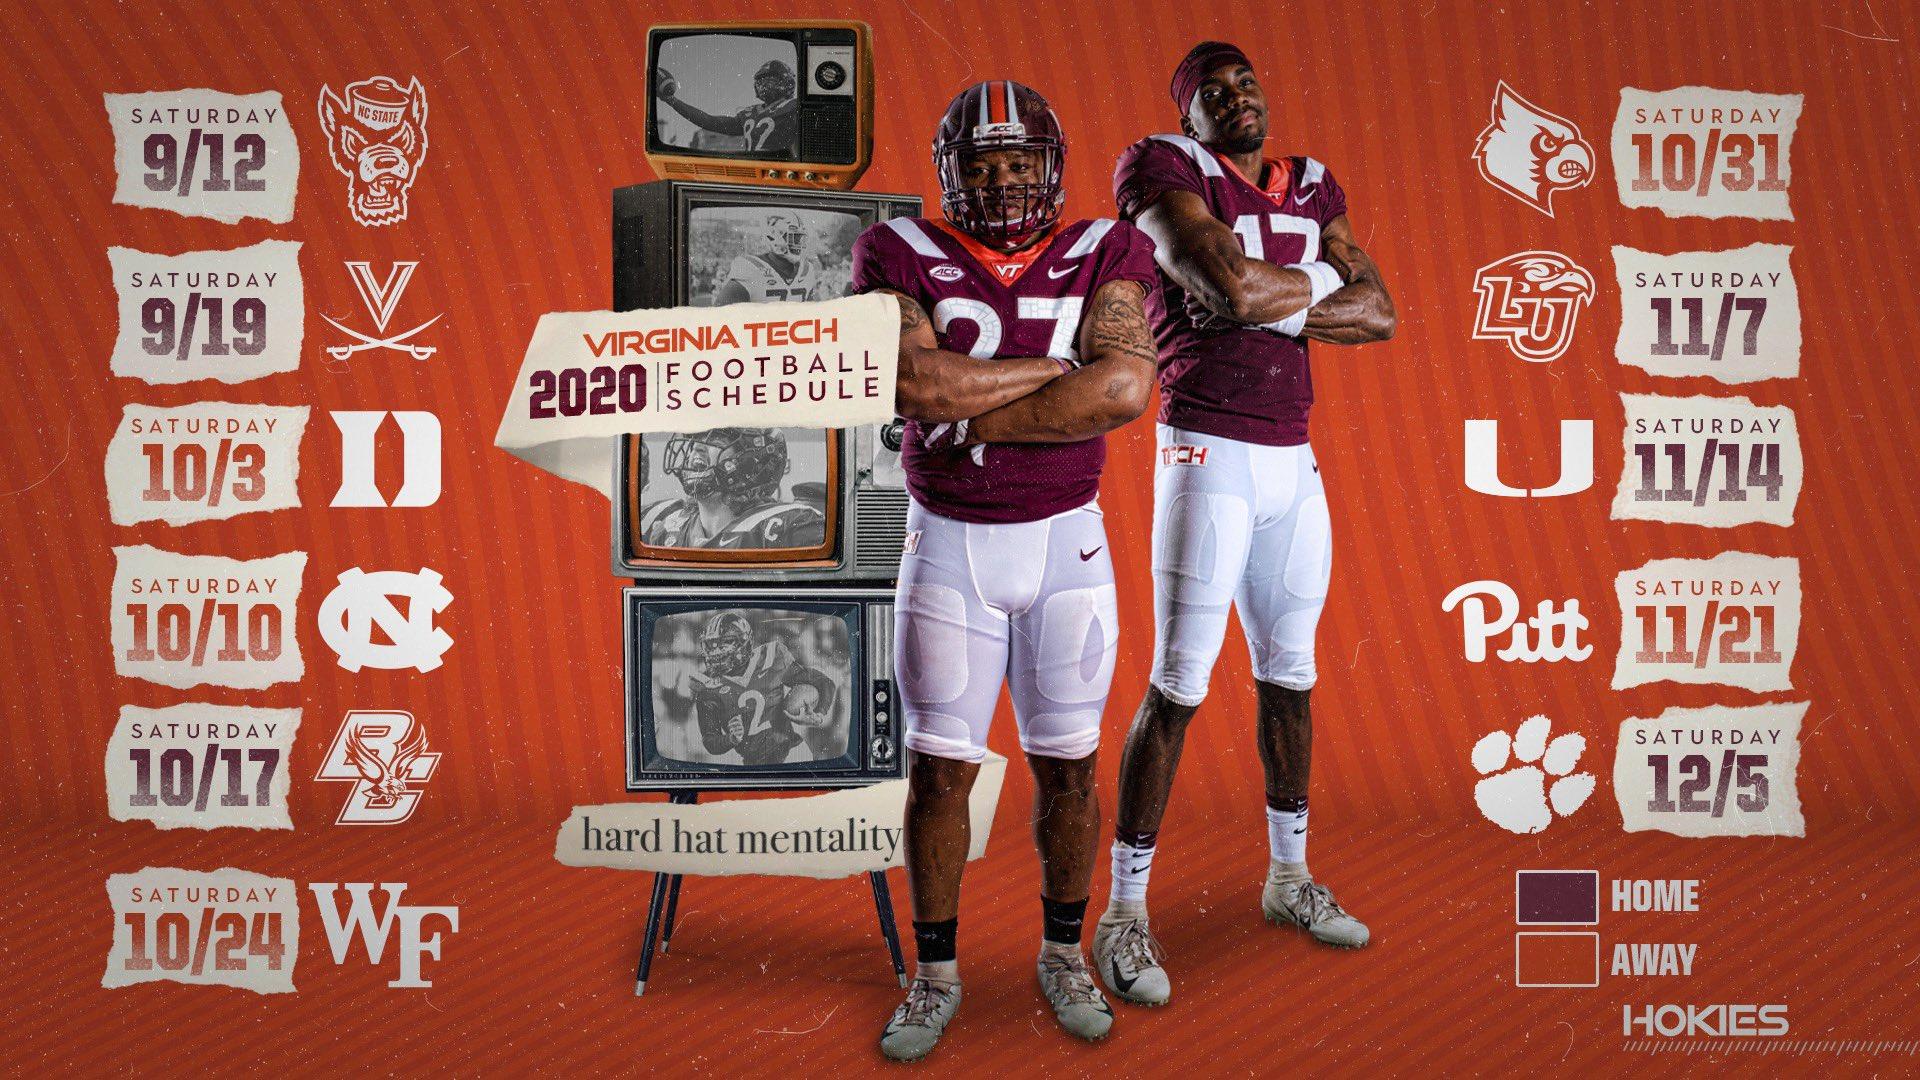 2020 Virginia Tech Football Schedule The Key Play